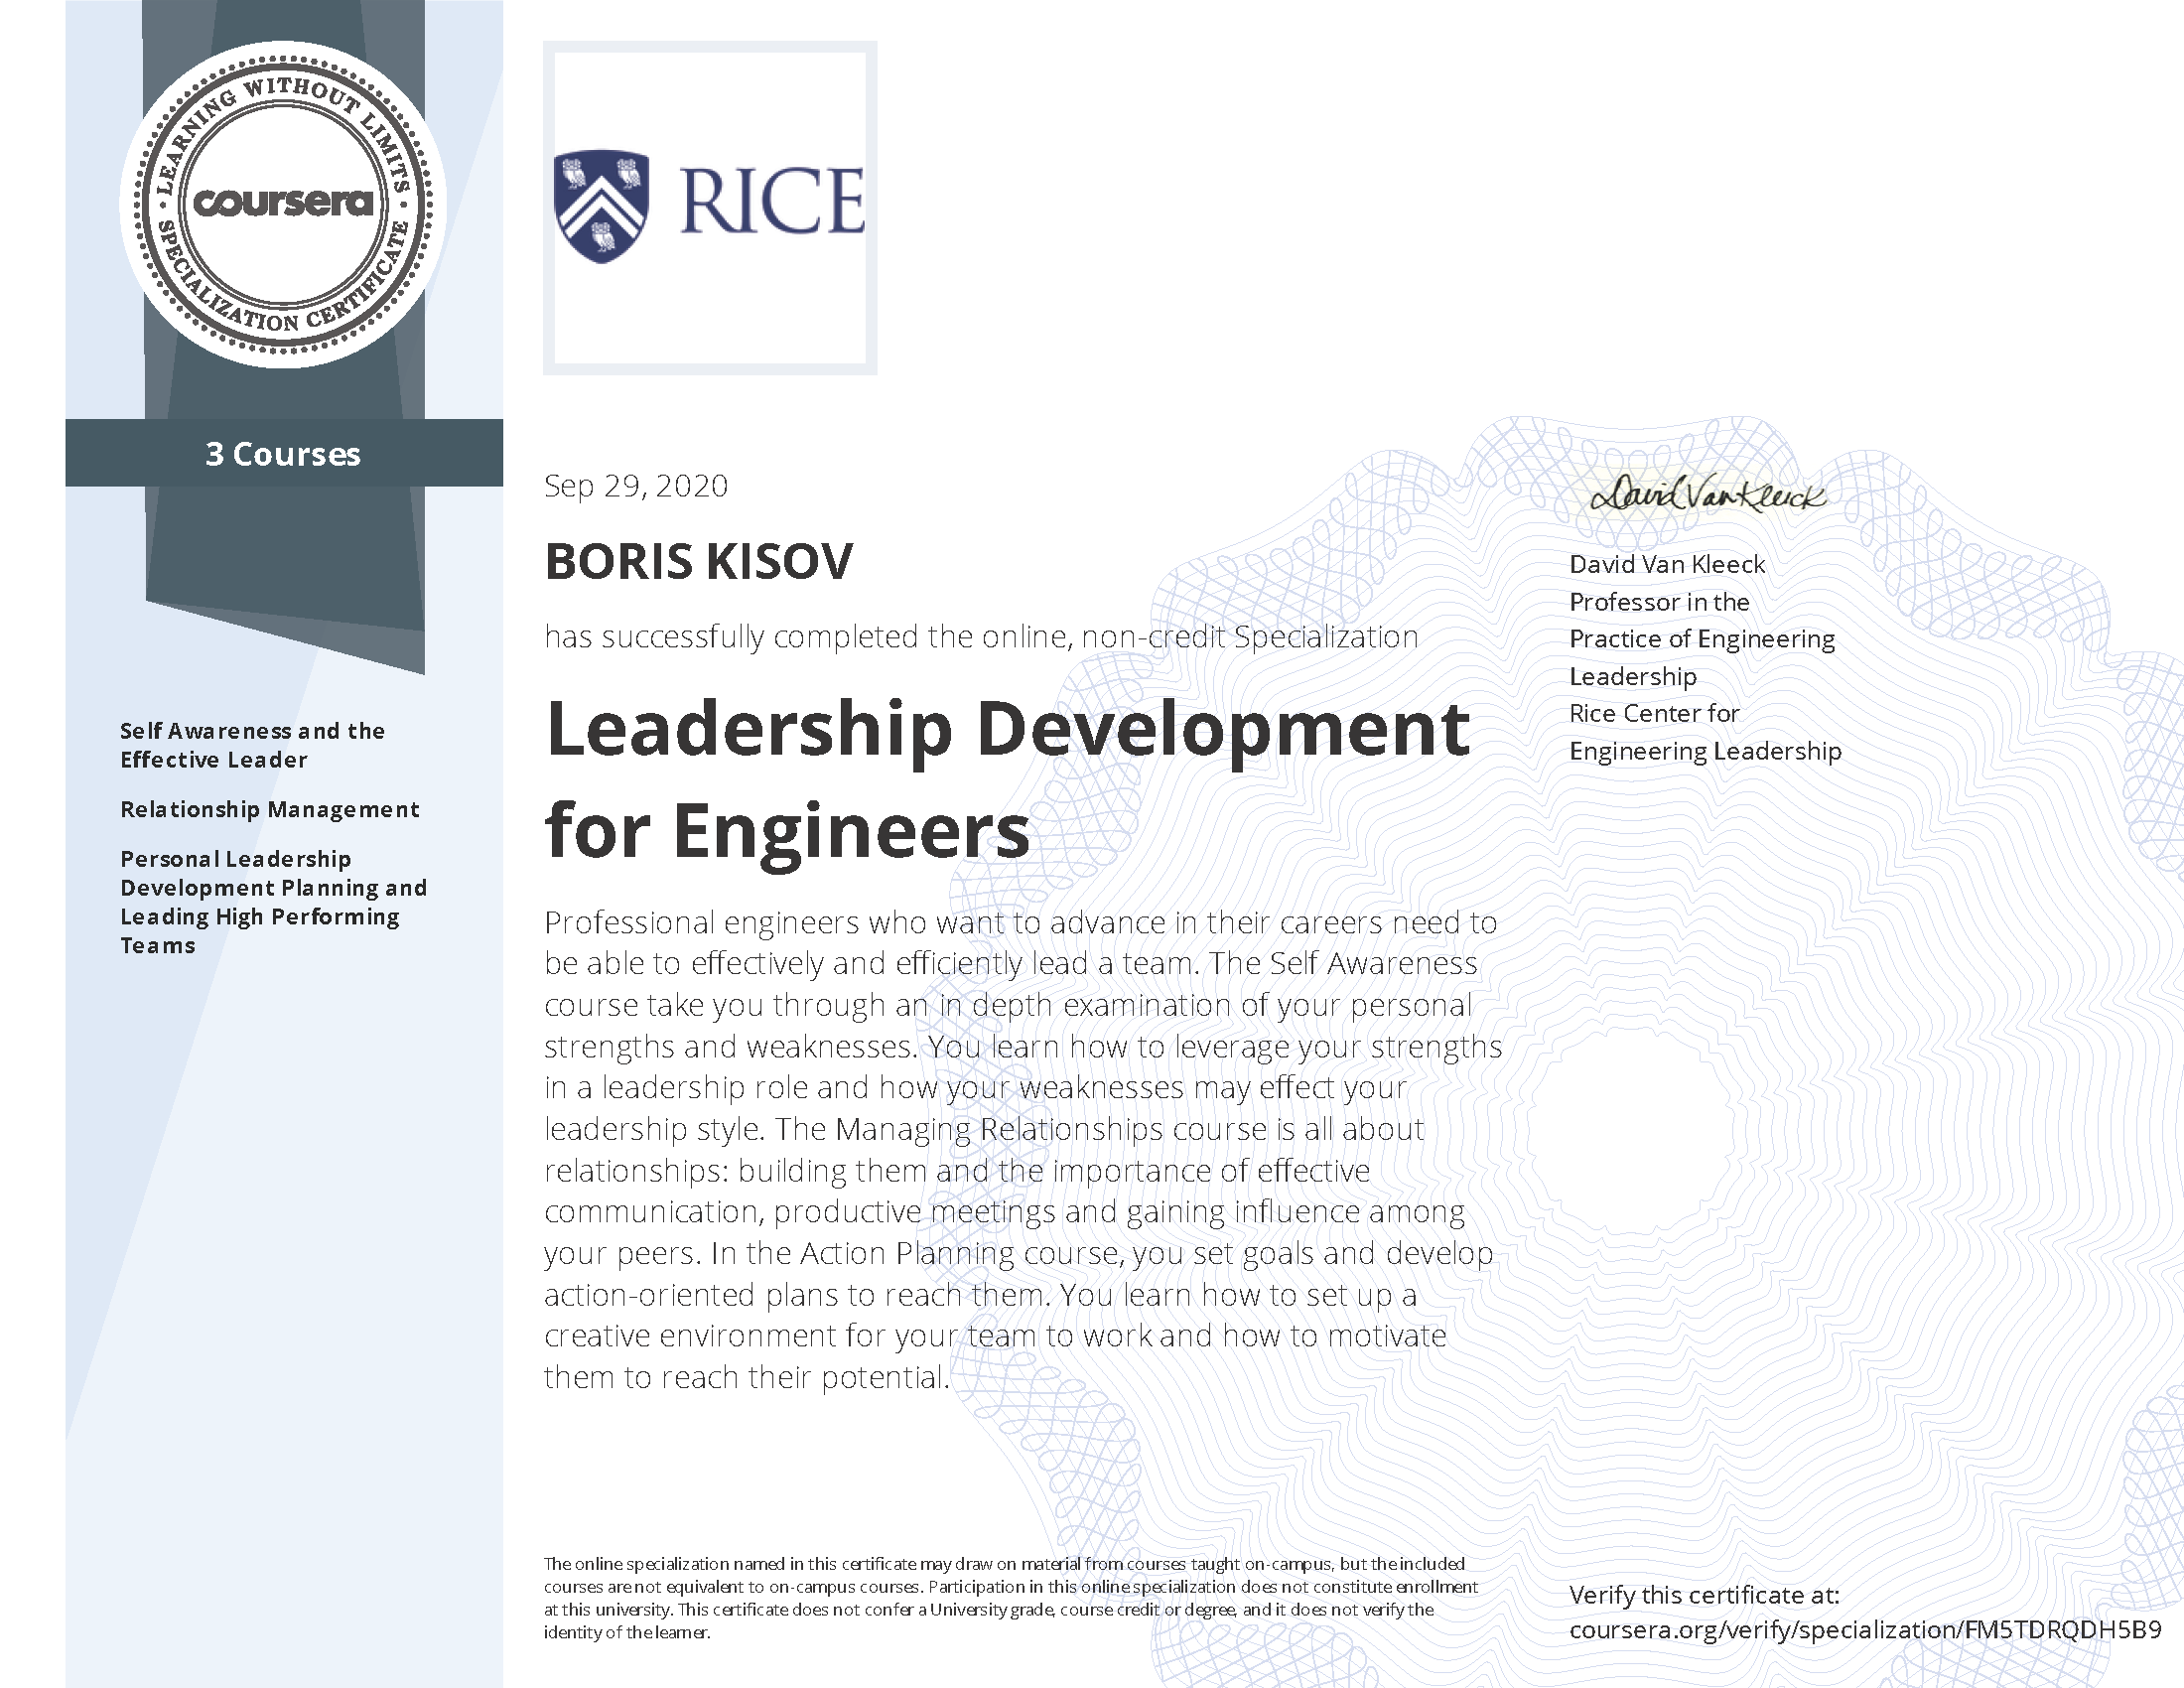 Leadership Development for Engineers